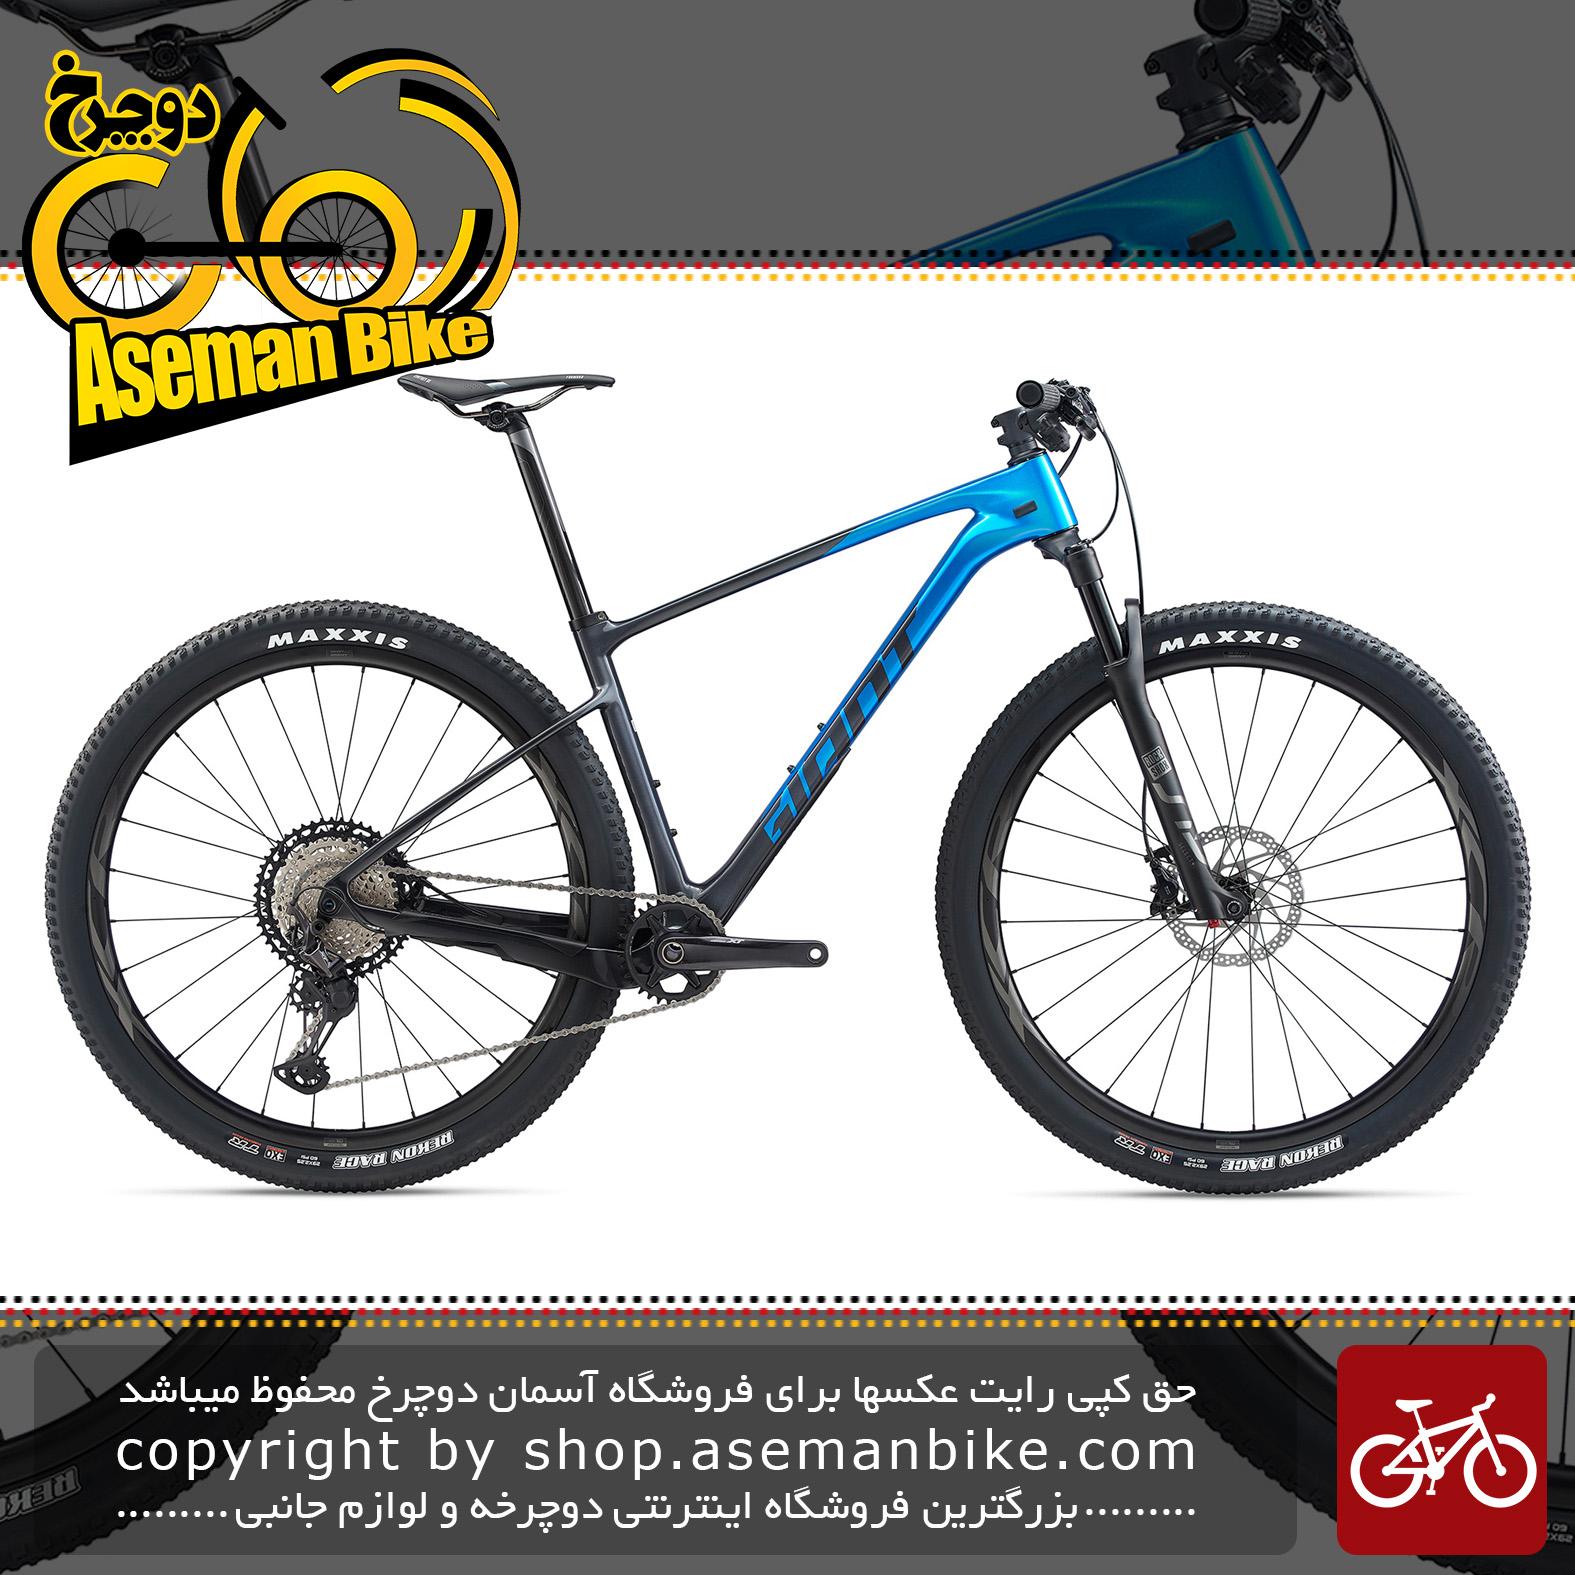 دوچرخه کوهستان جاینت مدل ایکس تی سی ادونس اس ال 29 اینچ 1 2020 Giant Mountain Bicycle XTC Advanced SL 29 1 2020